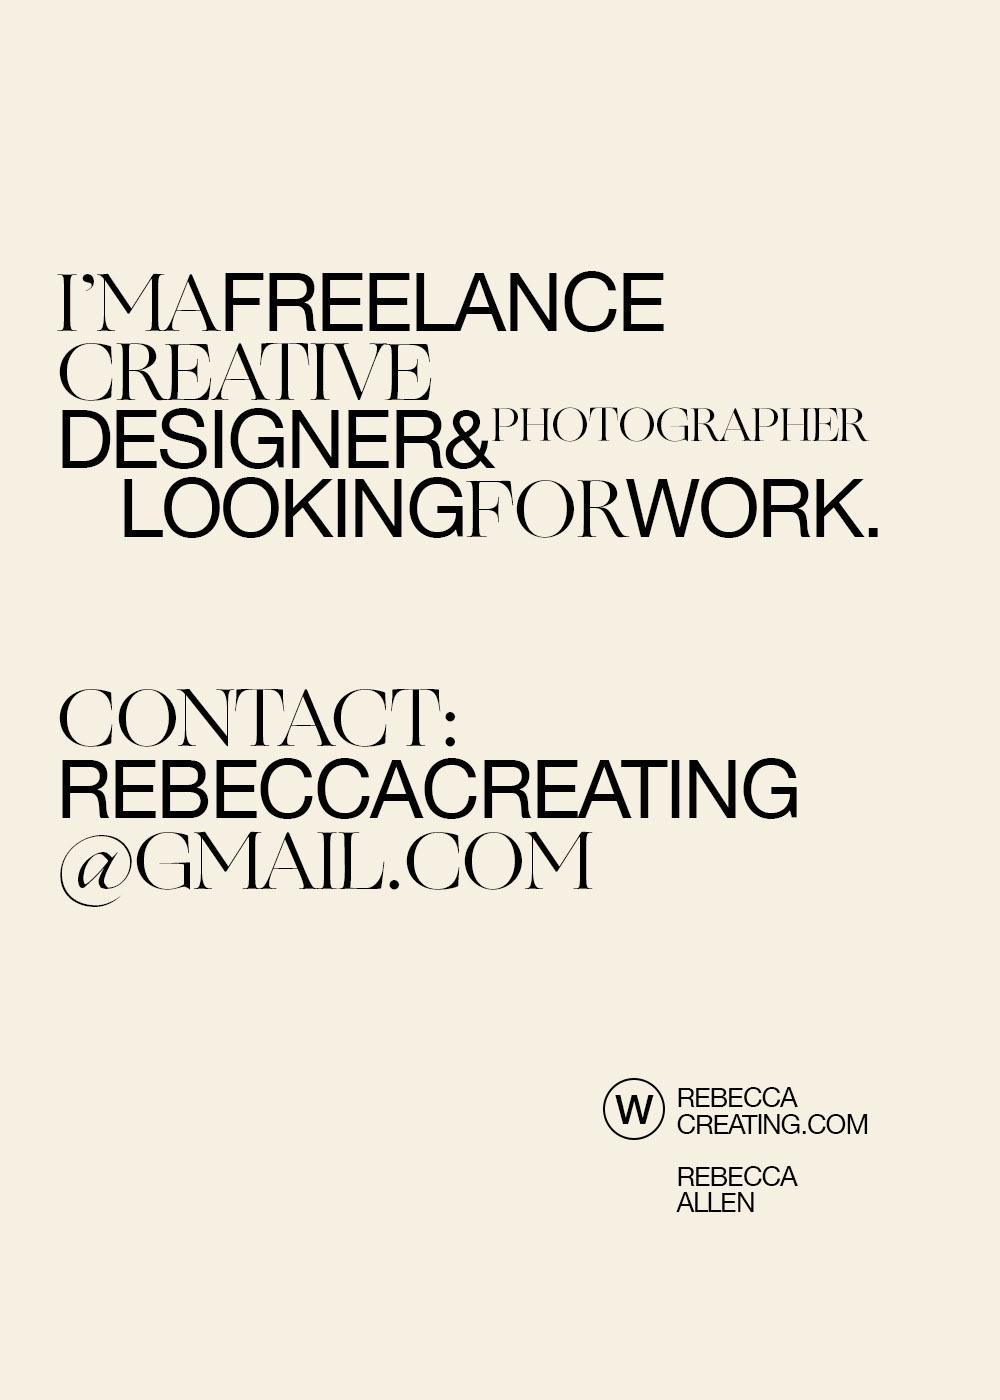 Rebecca-Allen-Type-Work.jpg